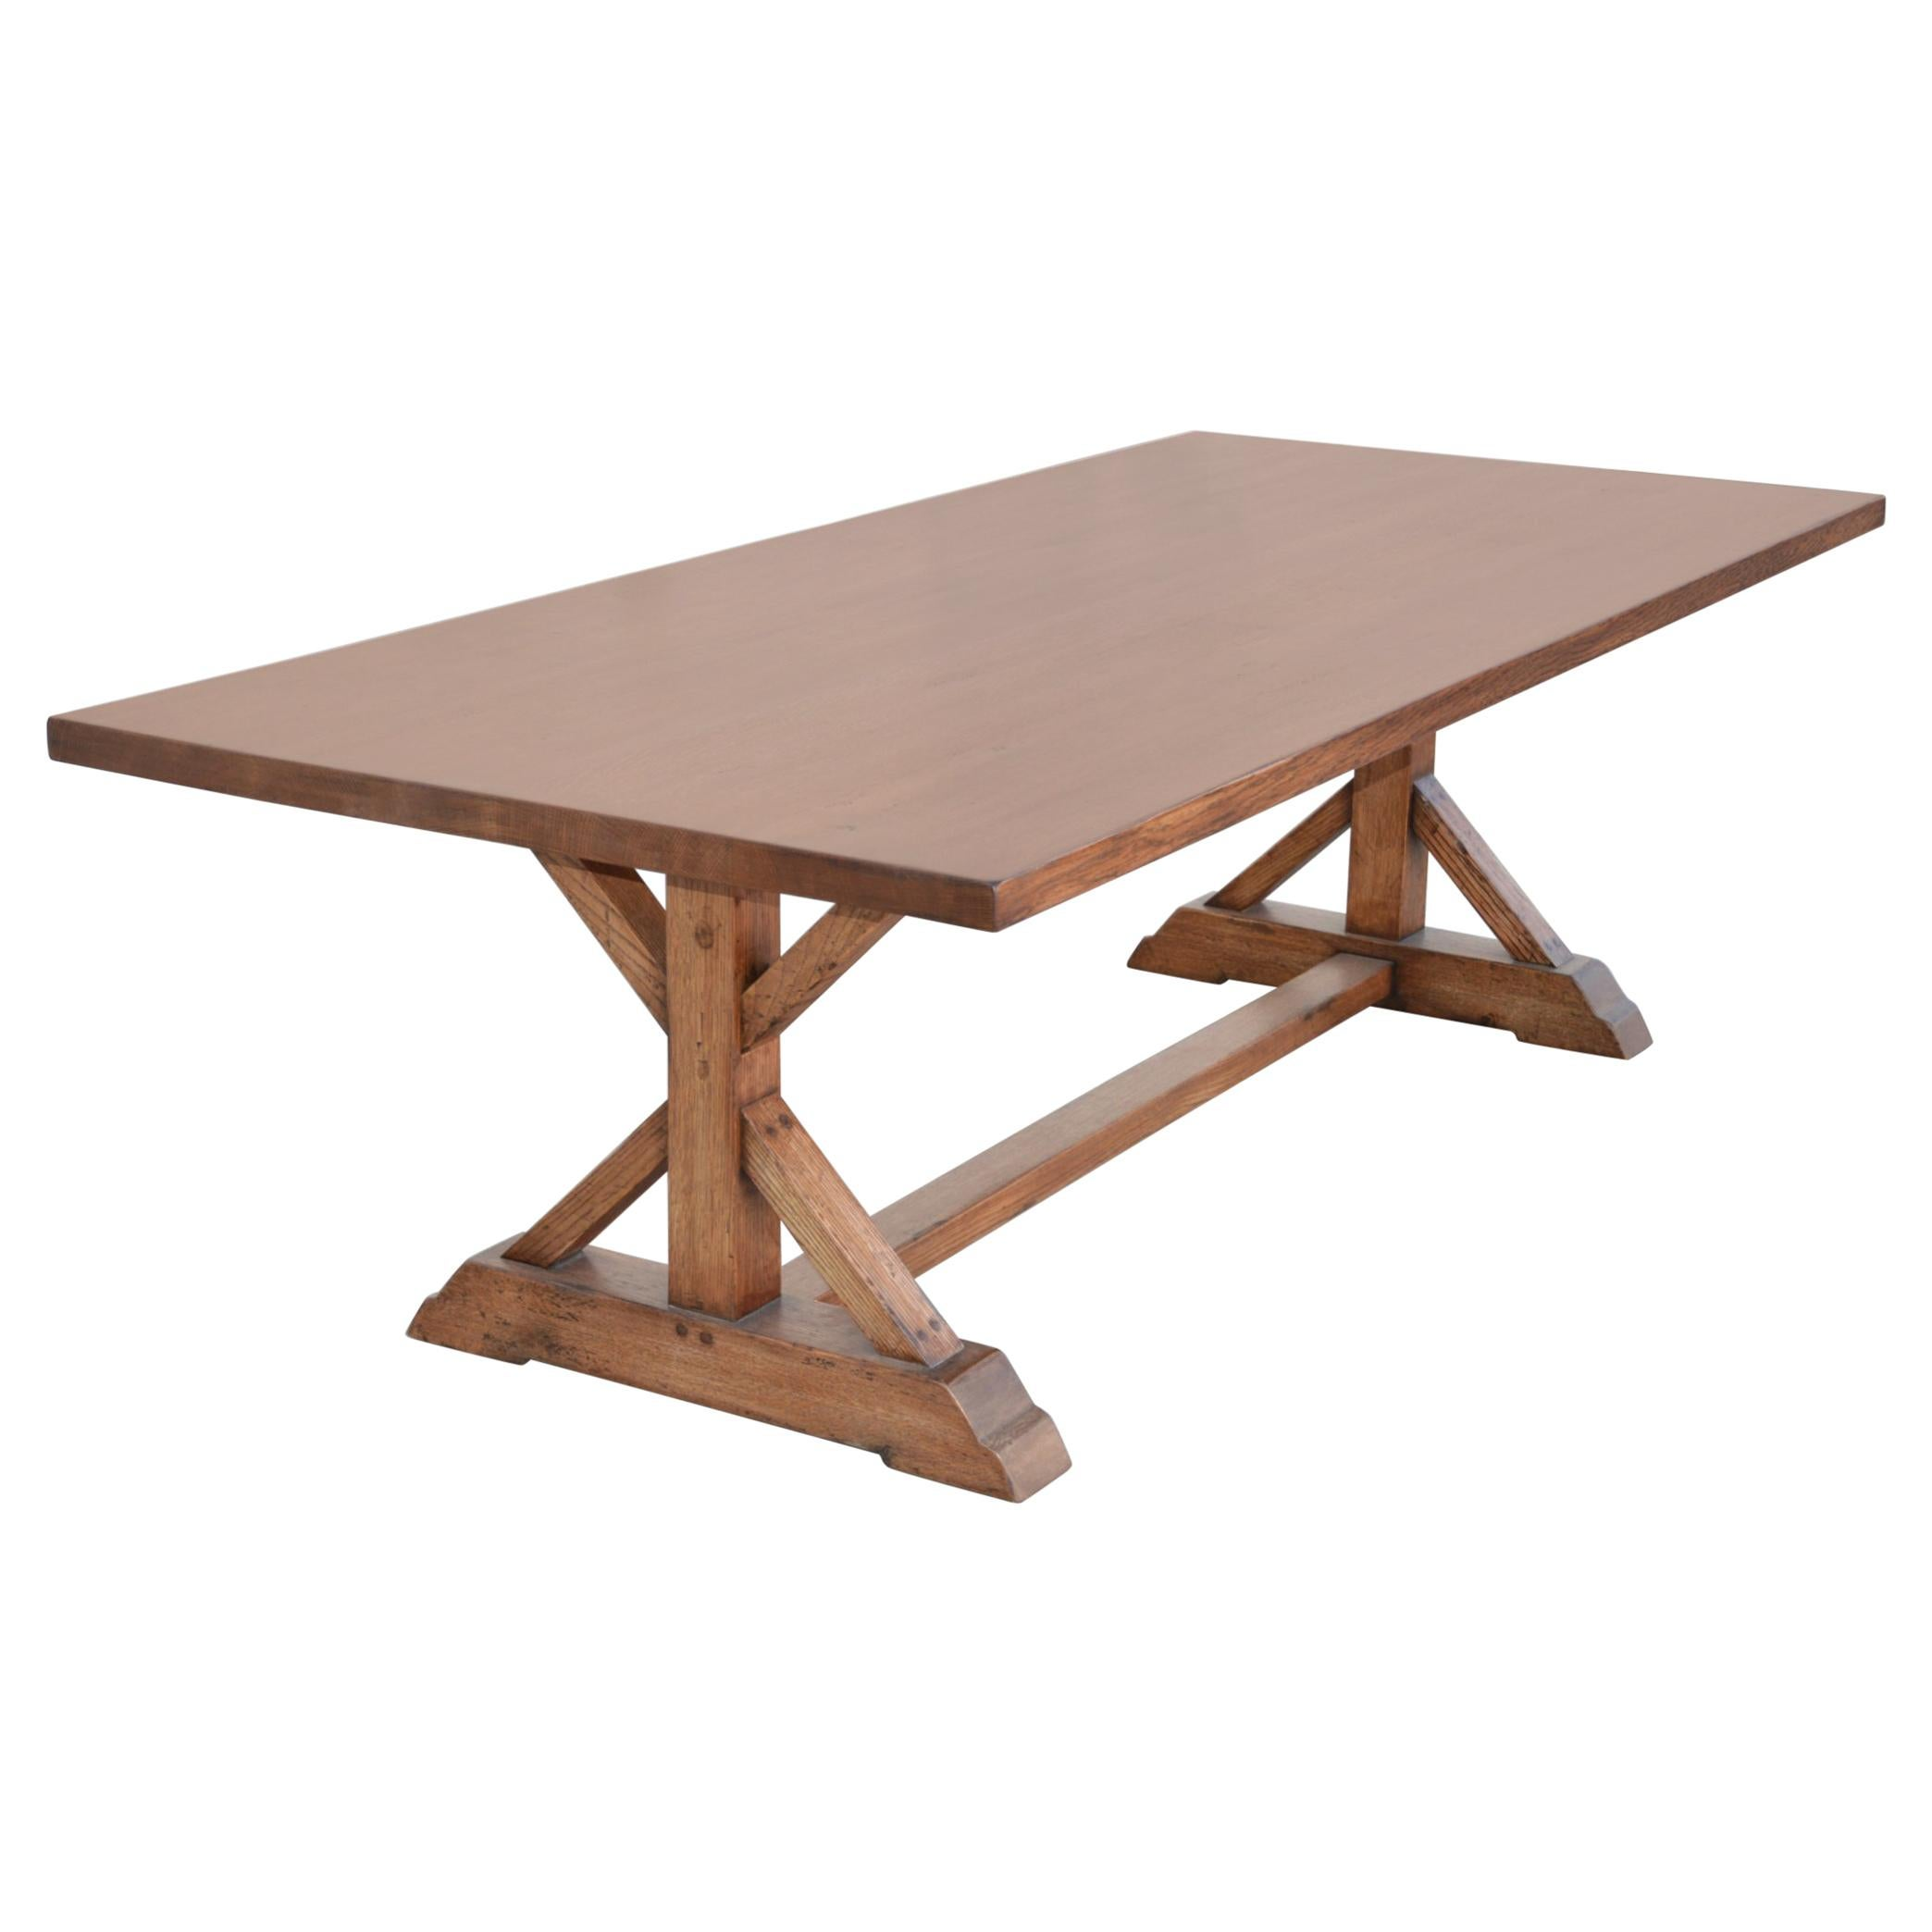 Custom Farm Table in Vintage White Oak